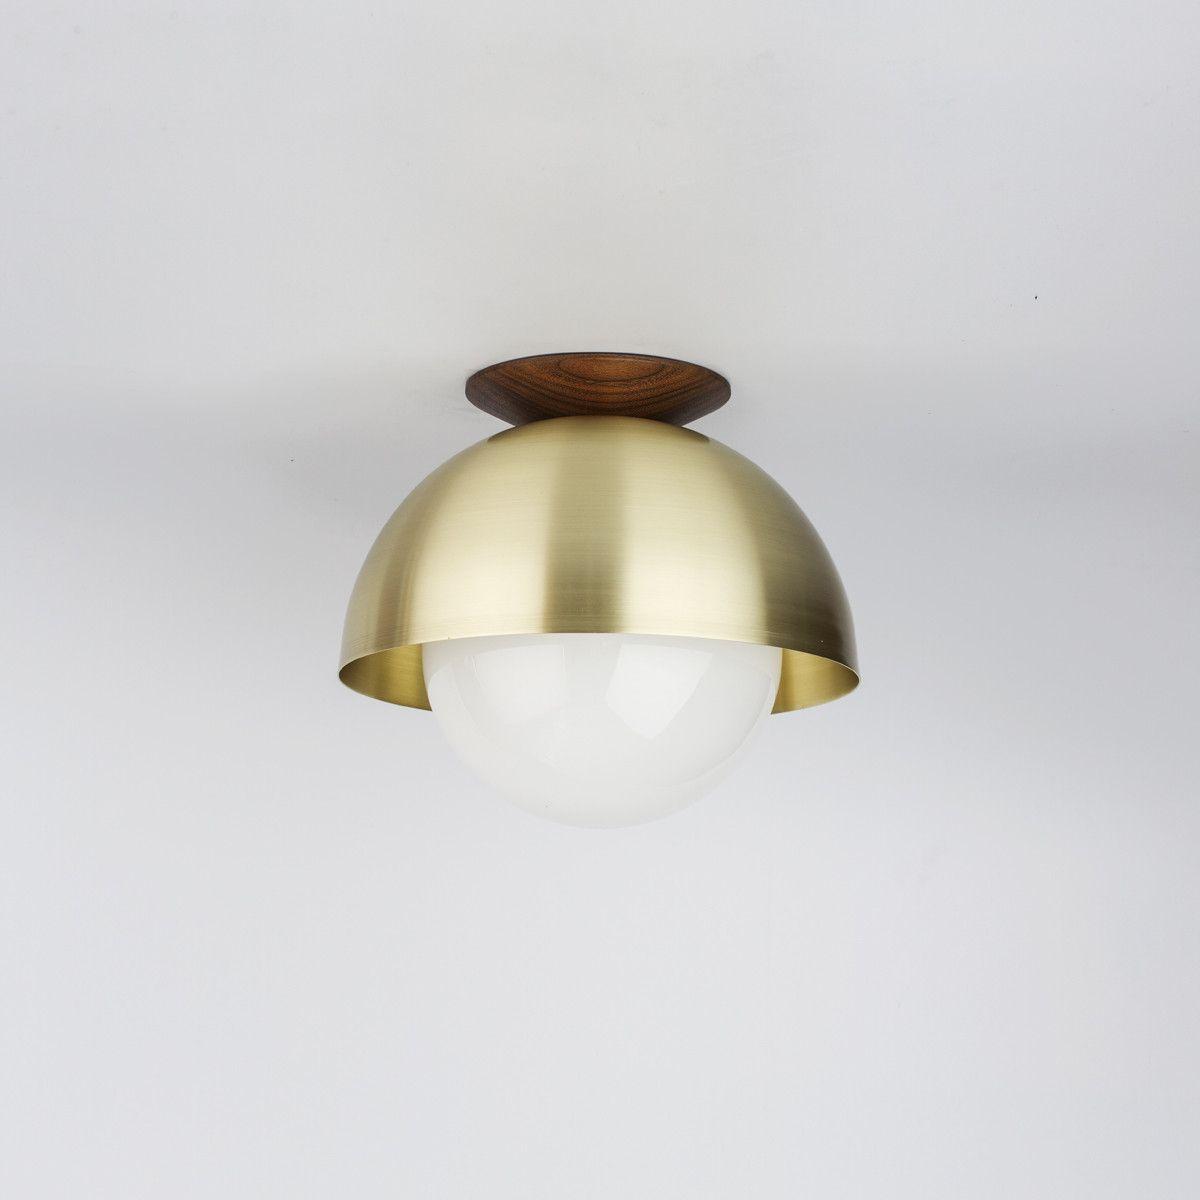 product image allied maker upstairs hallway lighting. Black Bedroom Furniture Sets. Home Design Ideas